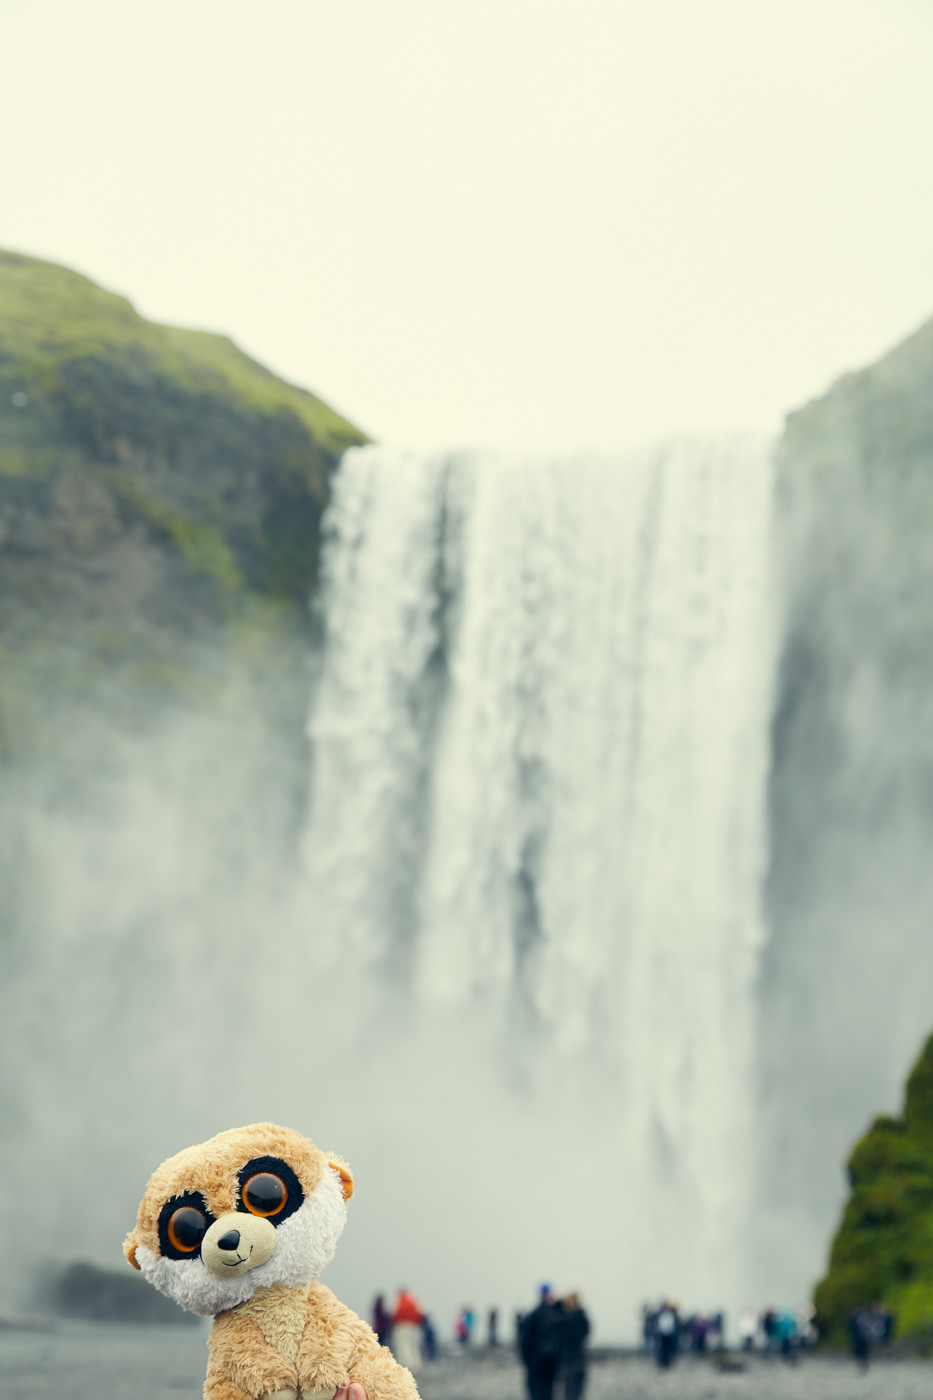 Skogafoss, Wasserfall, waterfall, Island, berühmt, famous, bucketlist, gigantisch, groß, viele Touristen, Ed, Ed das Erdmännchen, Reisemaskottchen